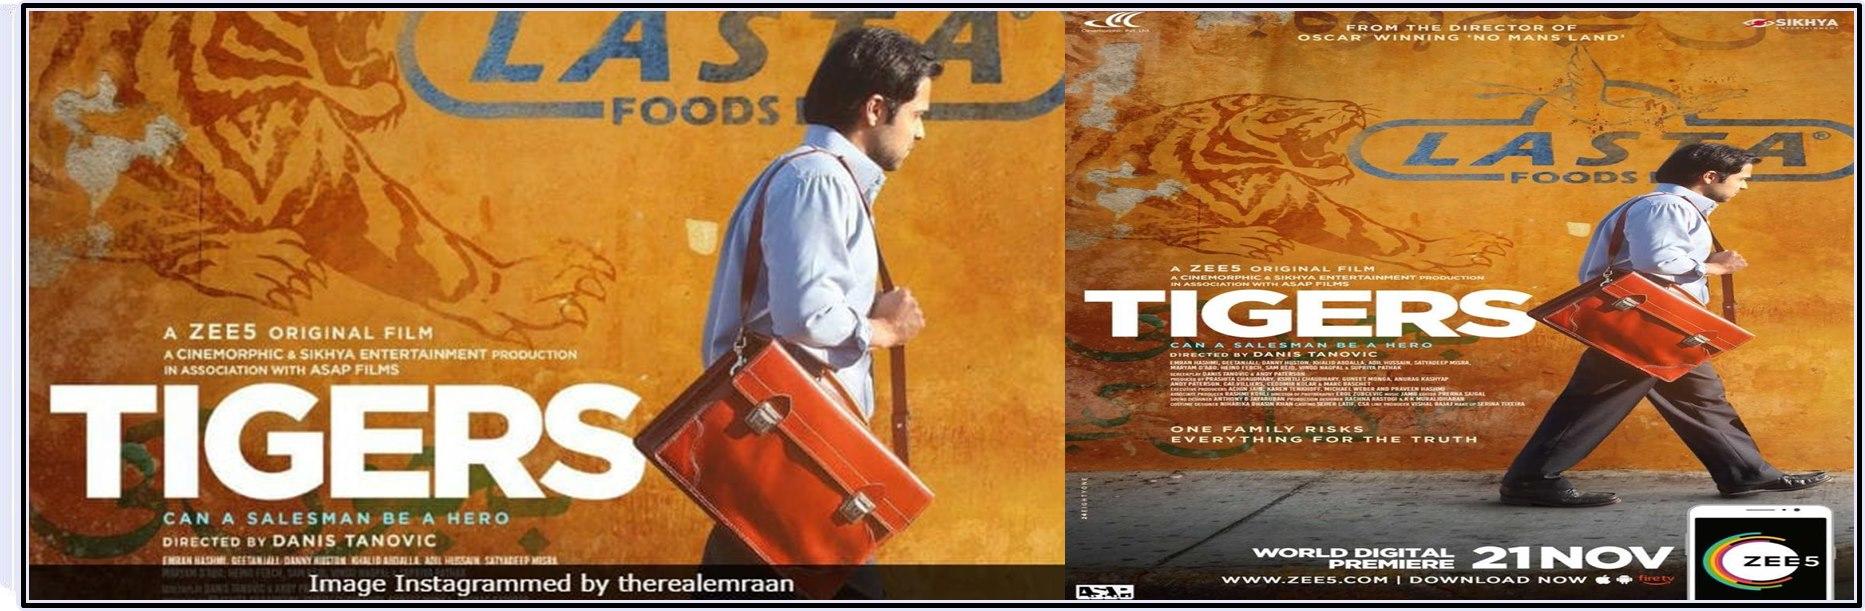 Tigers 2018 Full Movie Hindi 1080p - 720p - 480p ORG WEB-DL 300MB - 500MB - 1.3GB ESubs Free Download